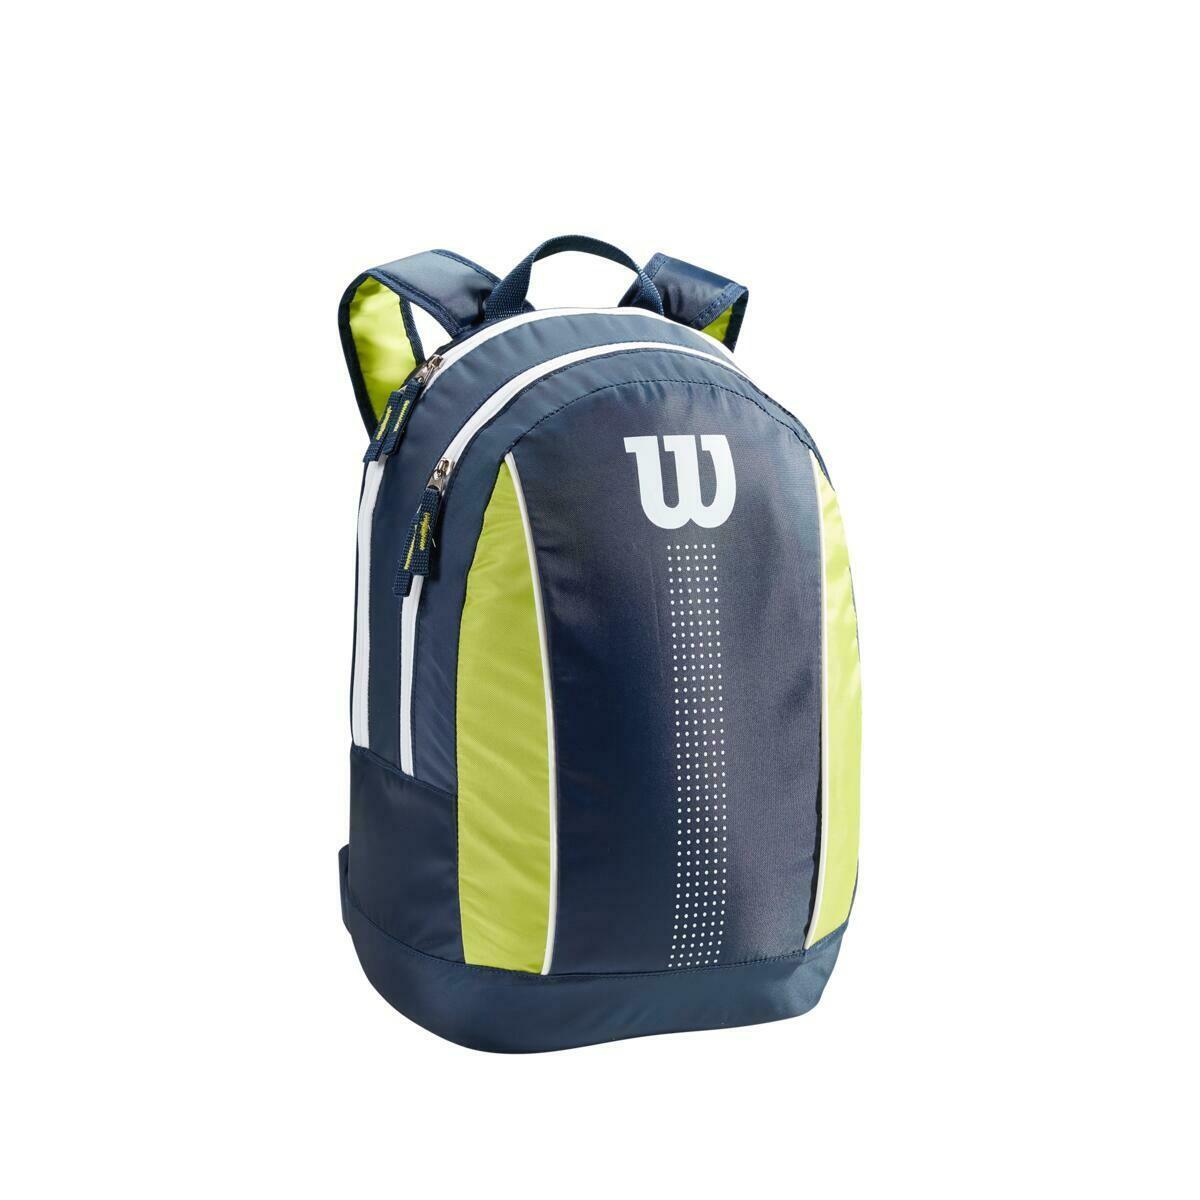 Wilson Junior Backpack - Navy/Lime